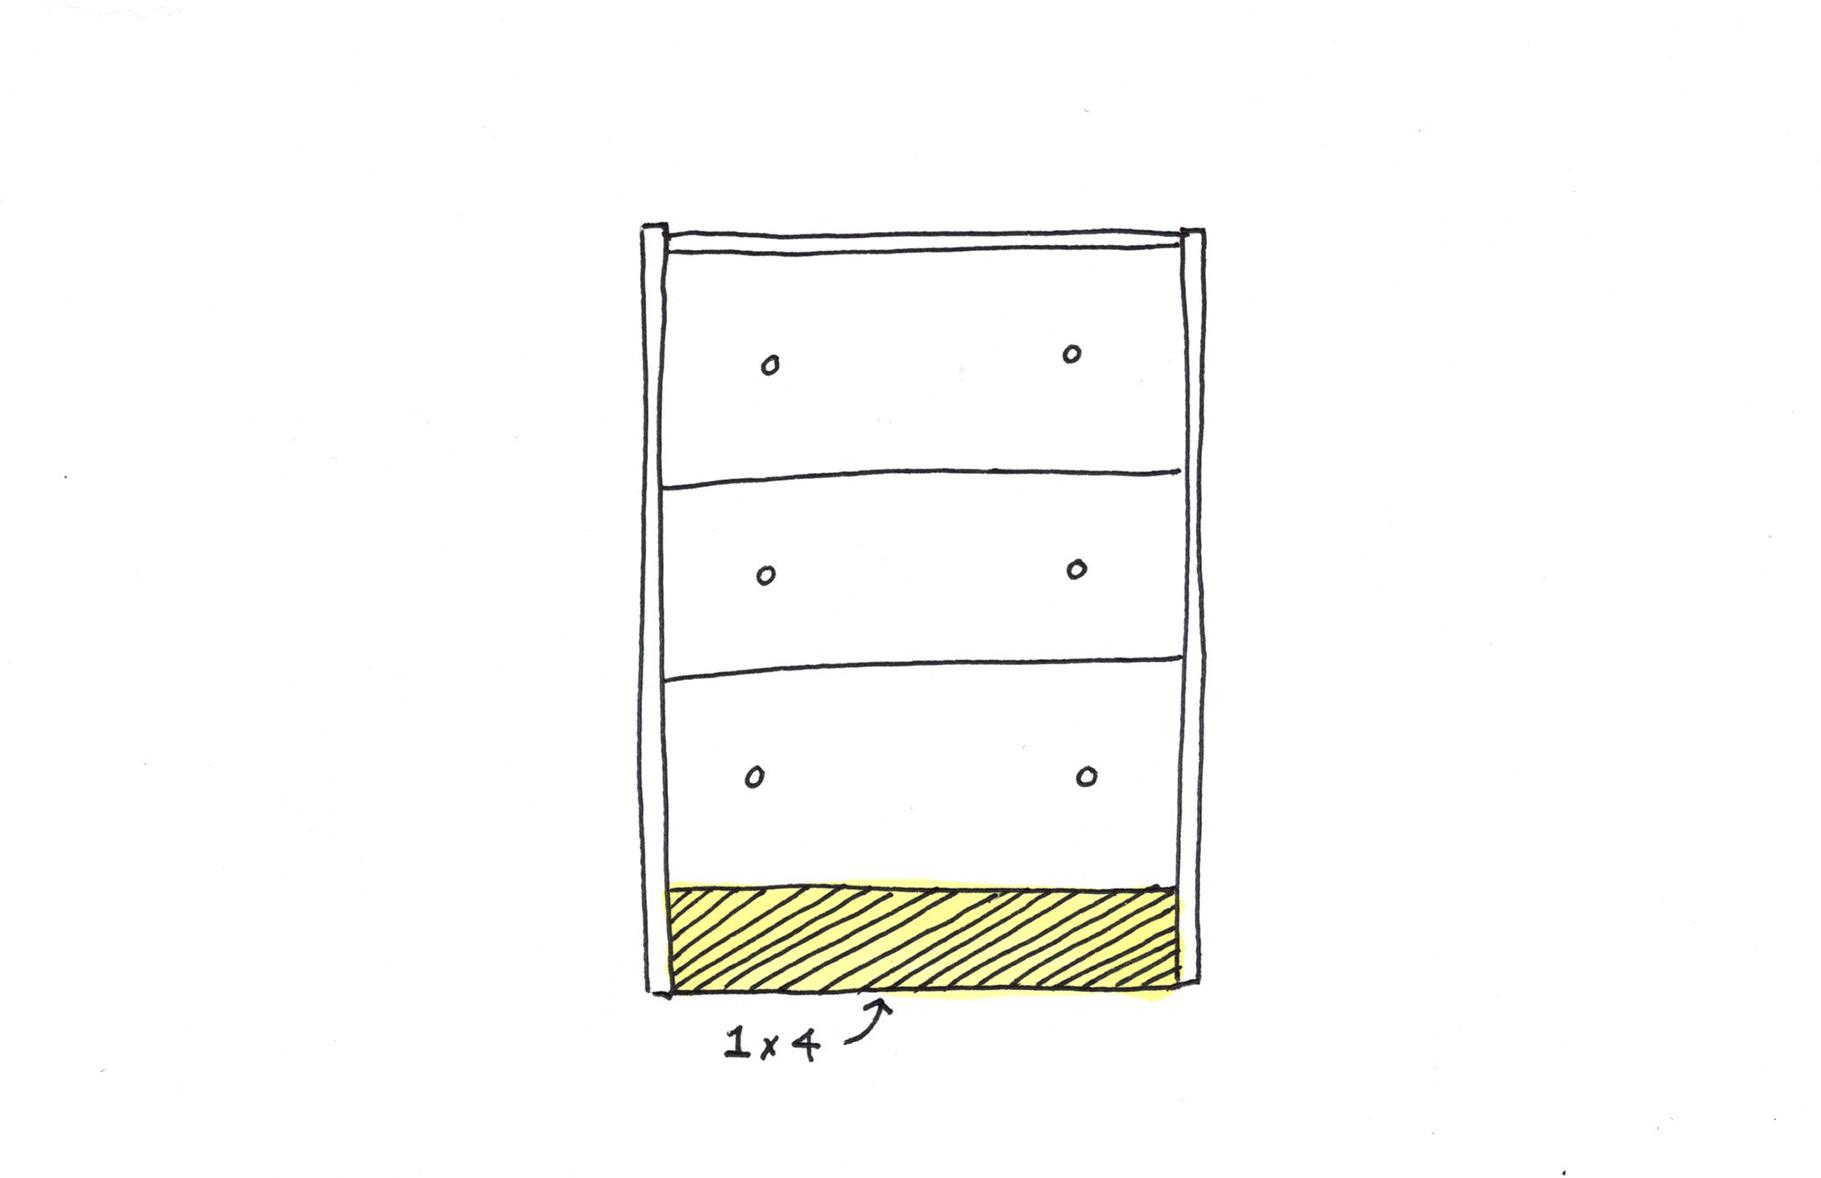 closet-2.1.jpg